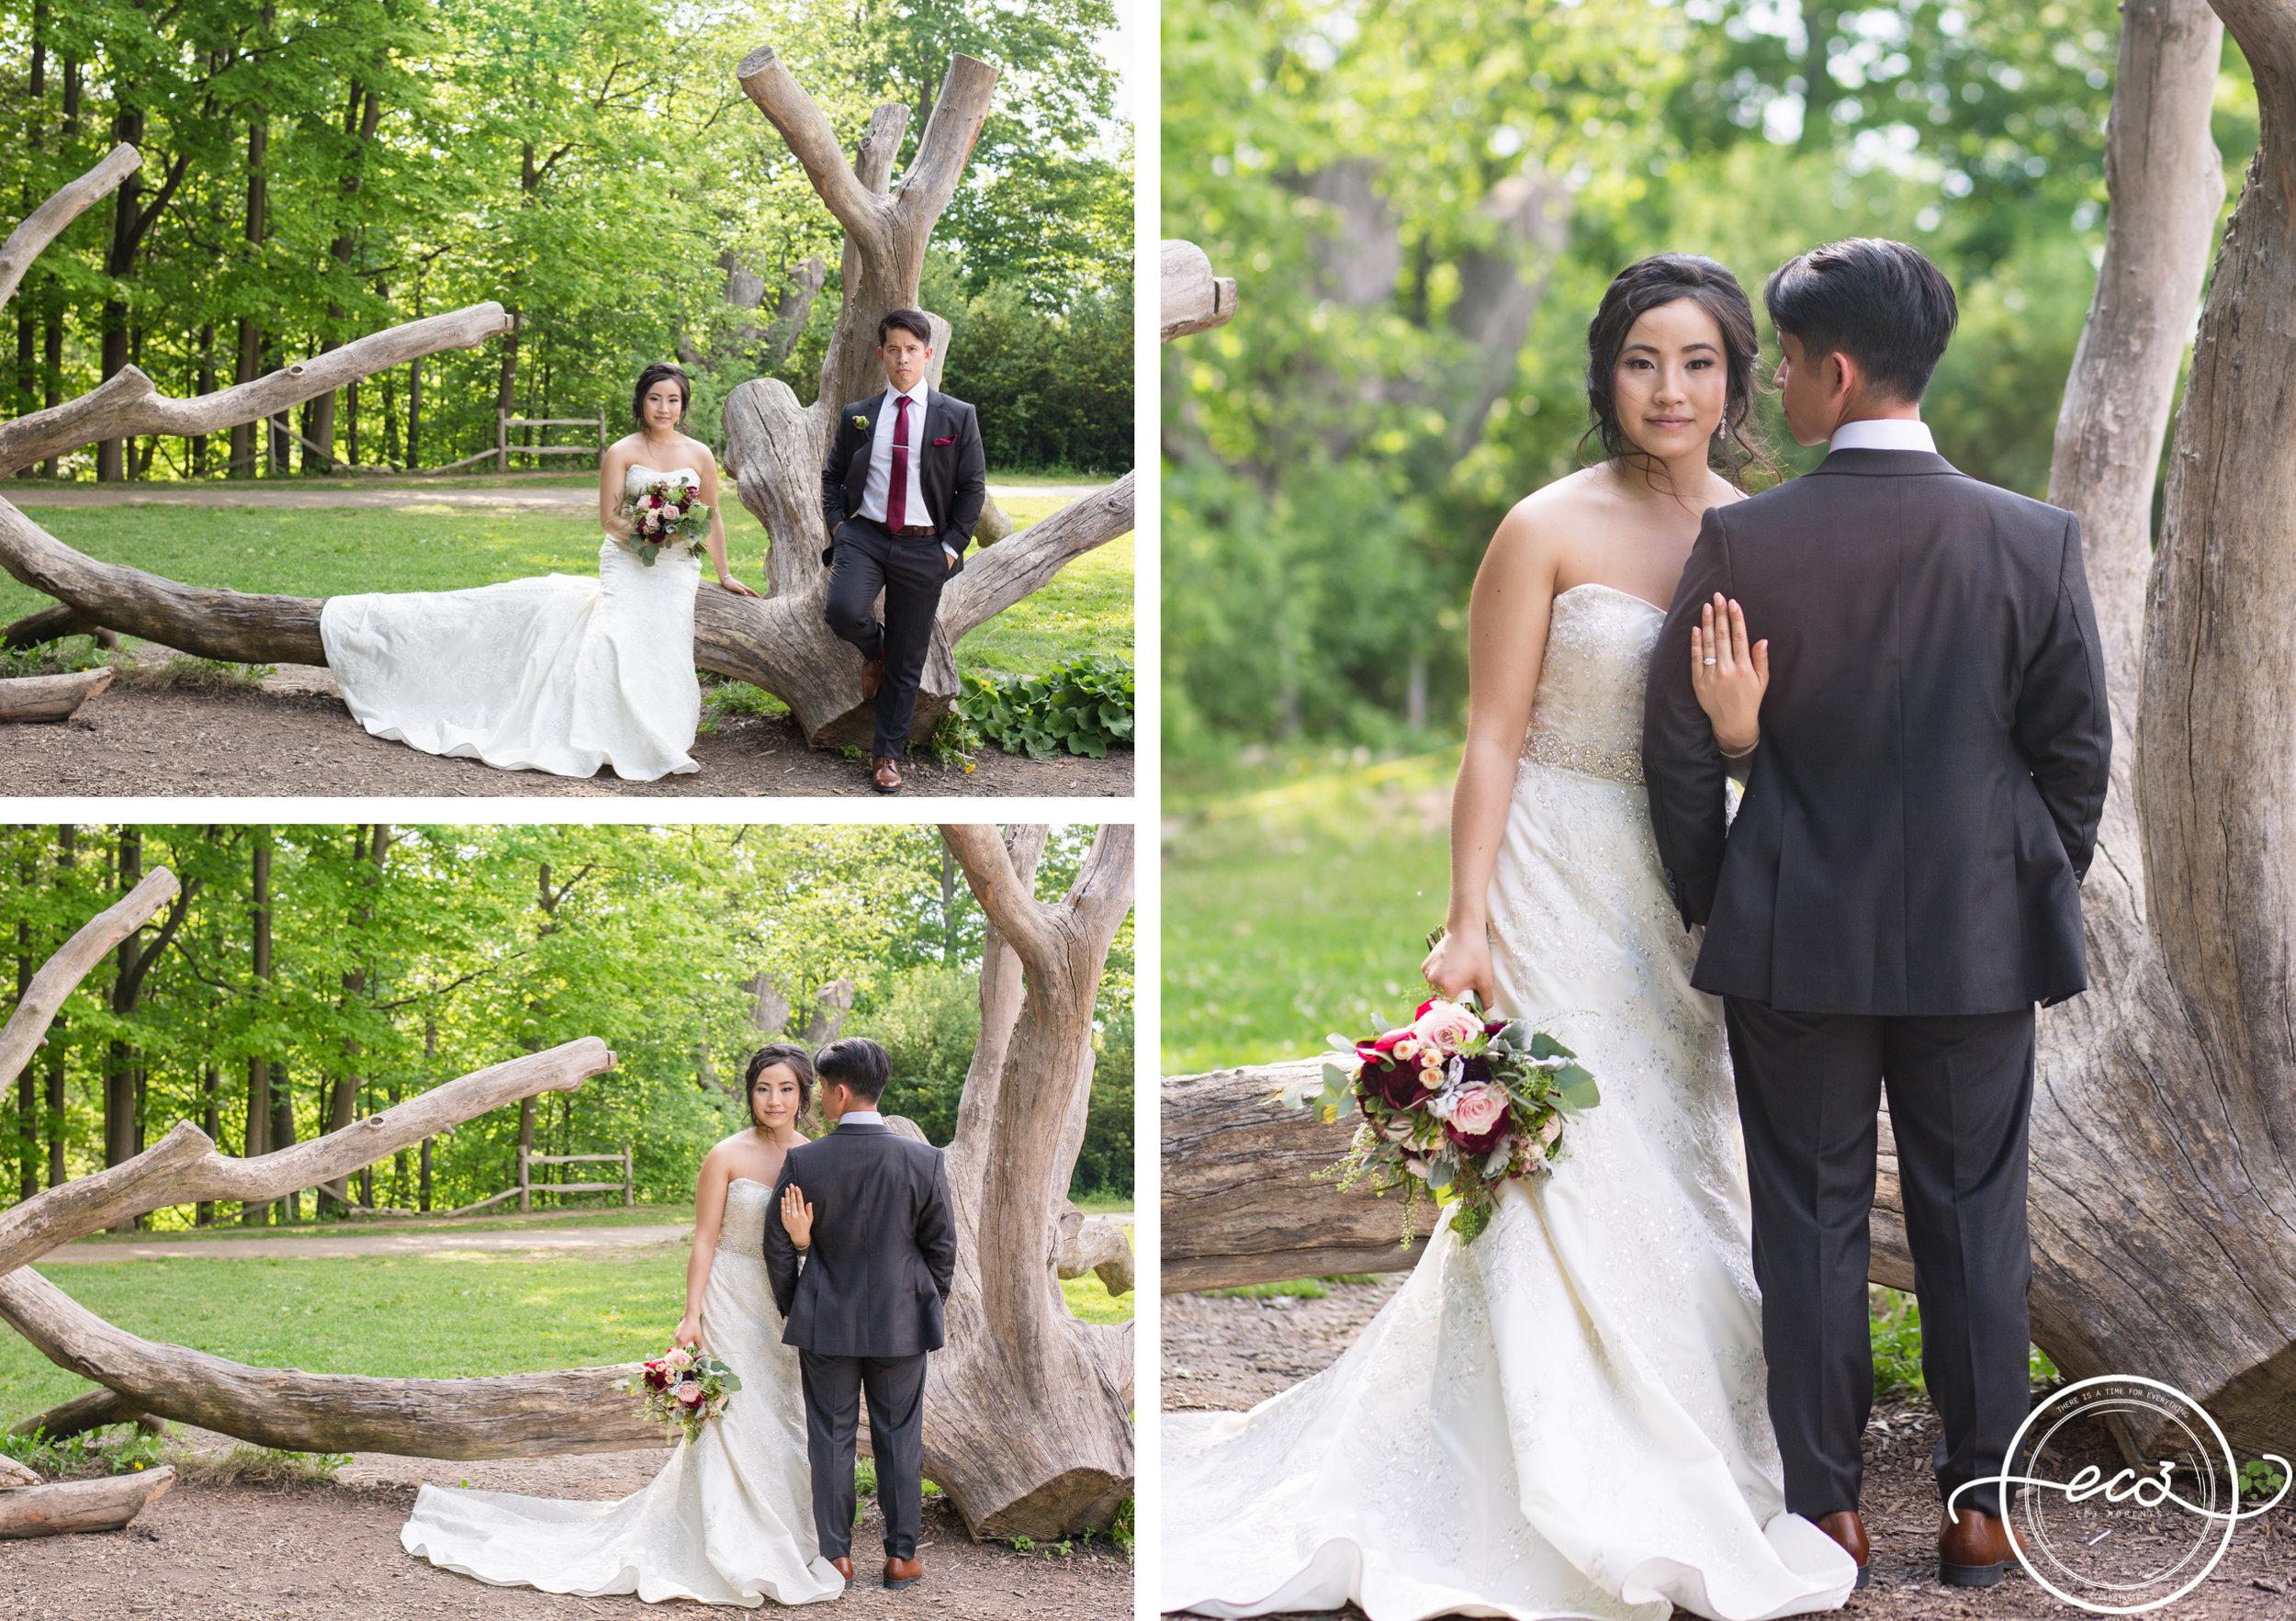 Toronto Edwards Garden and Intimate Vietnamese Wedding27.jpg